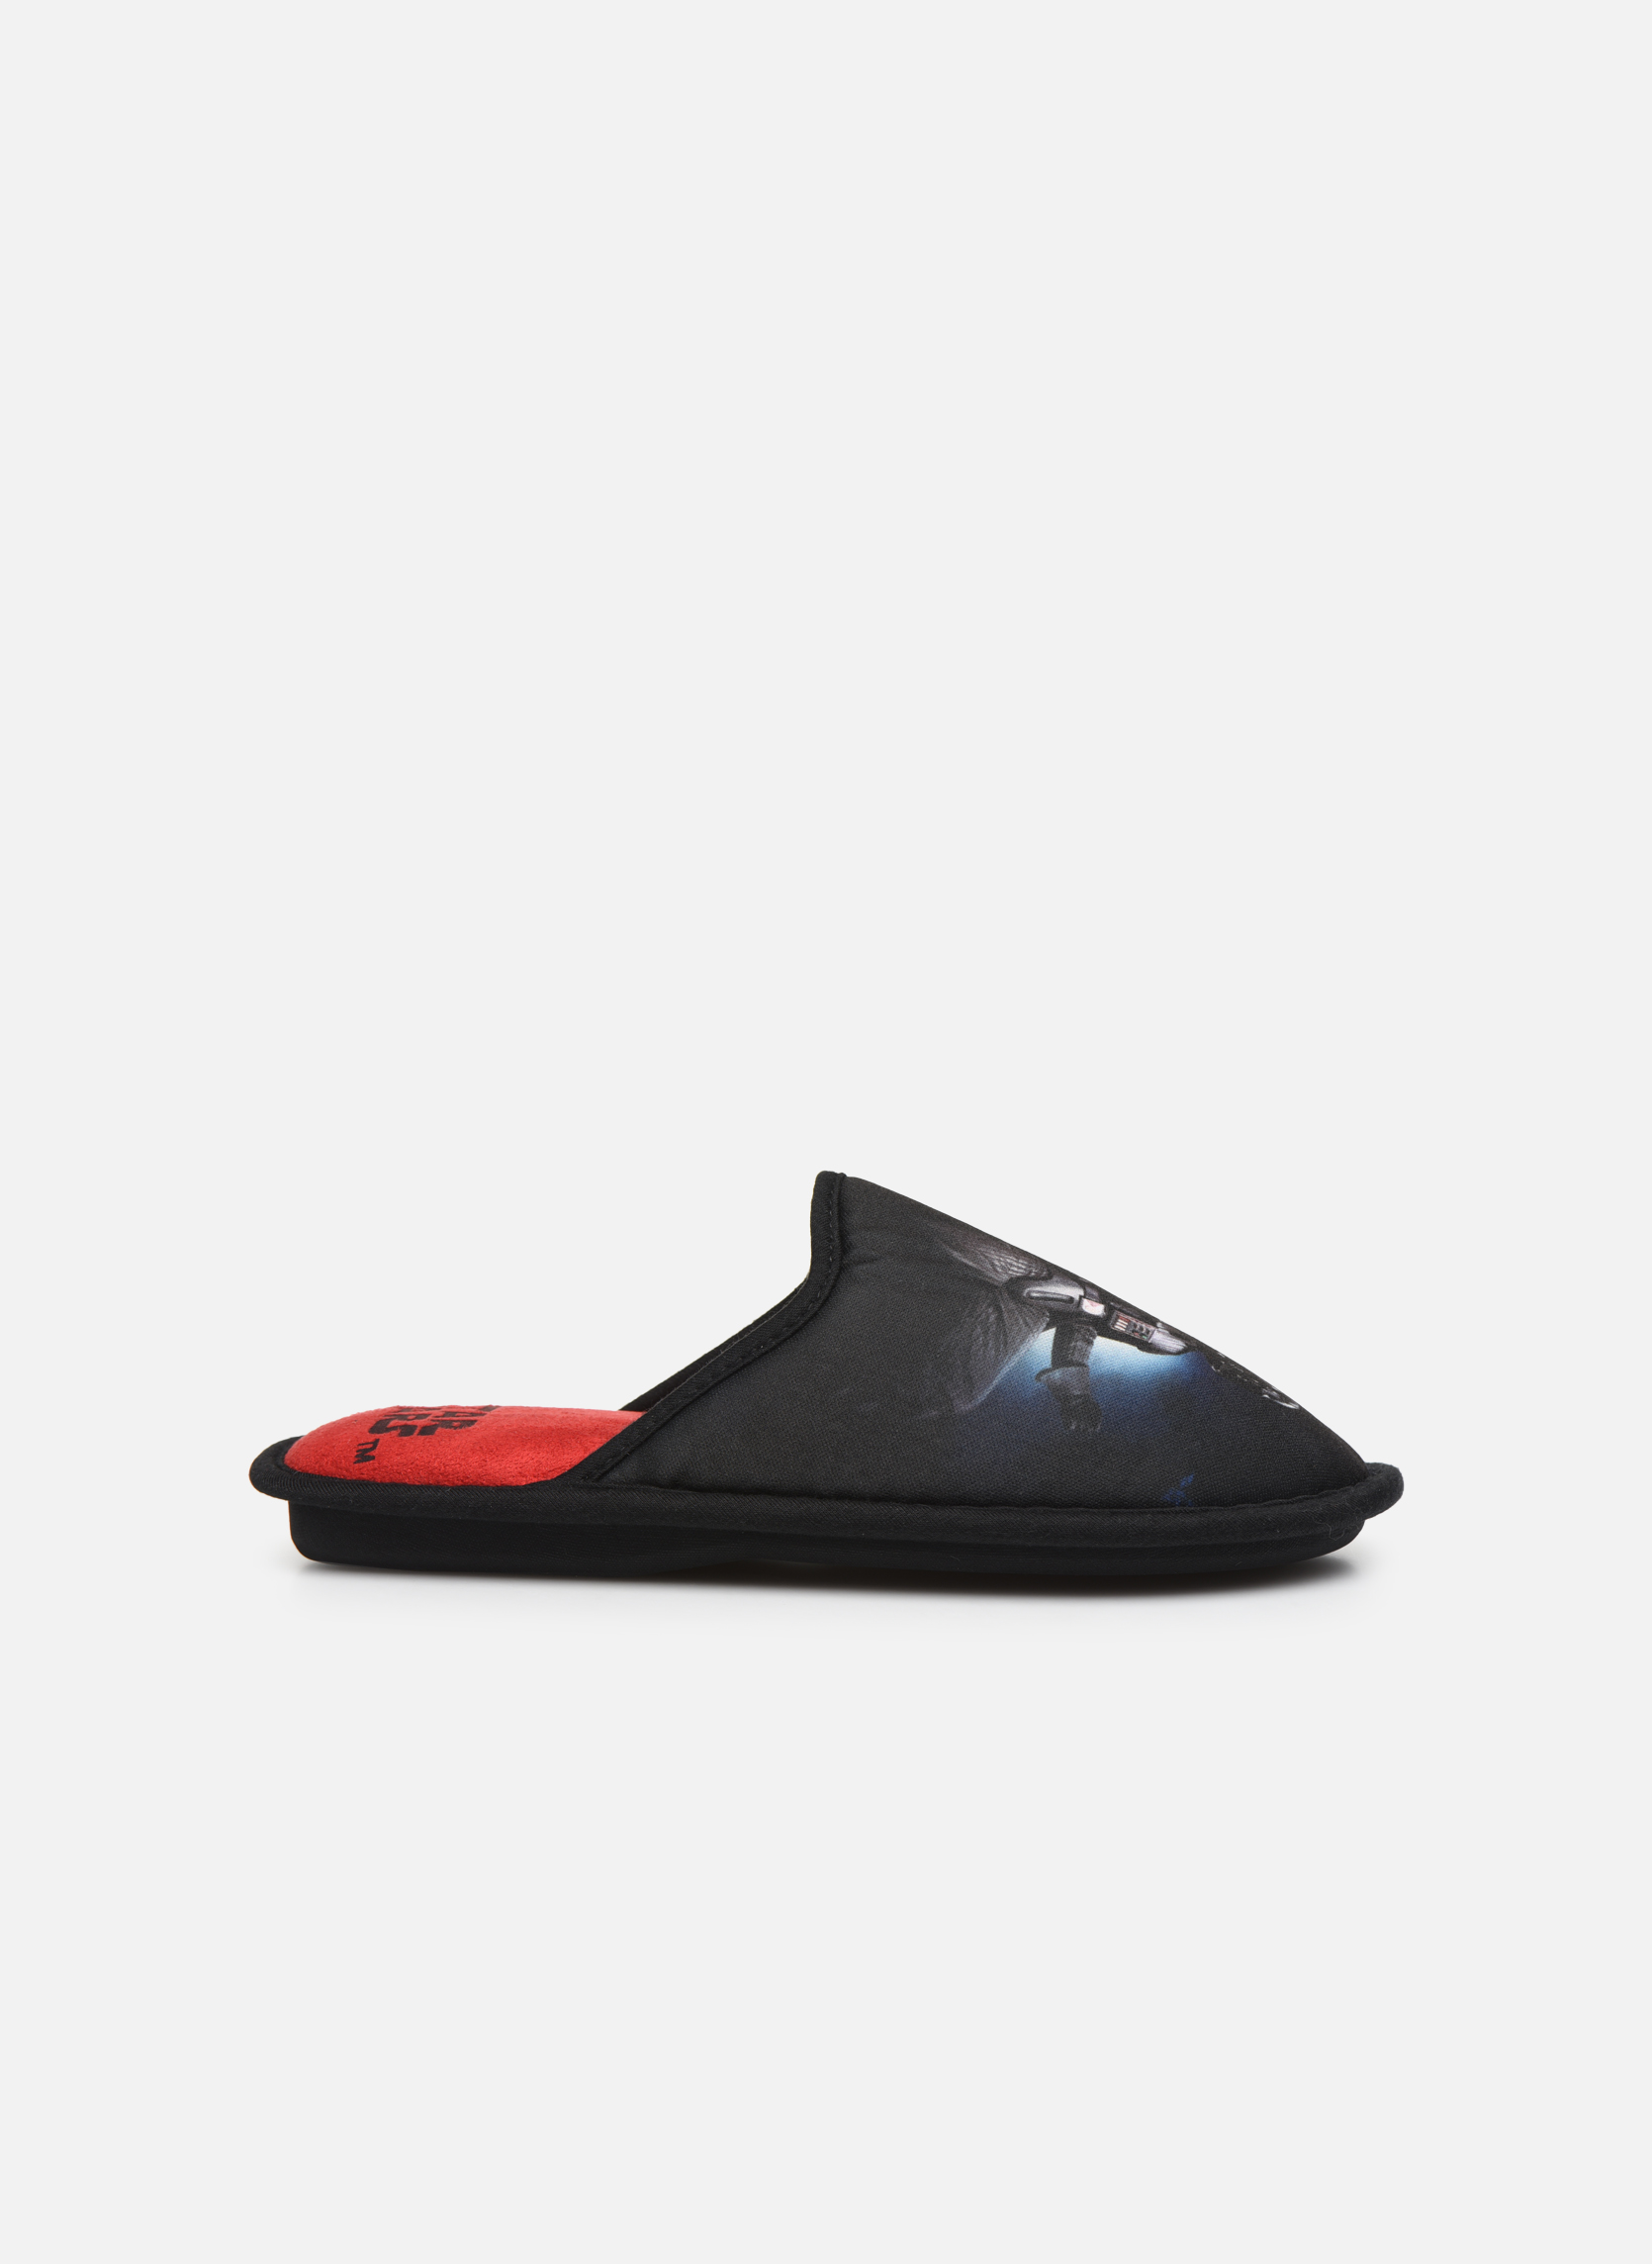 Salignon Star Wars Noir/rouge